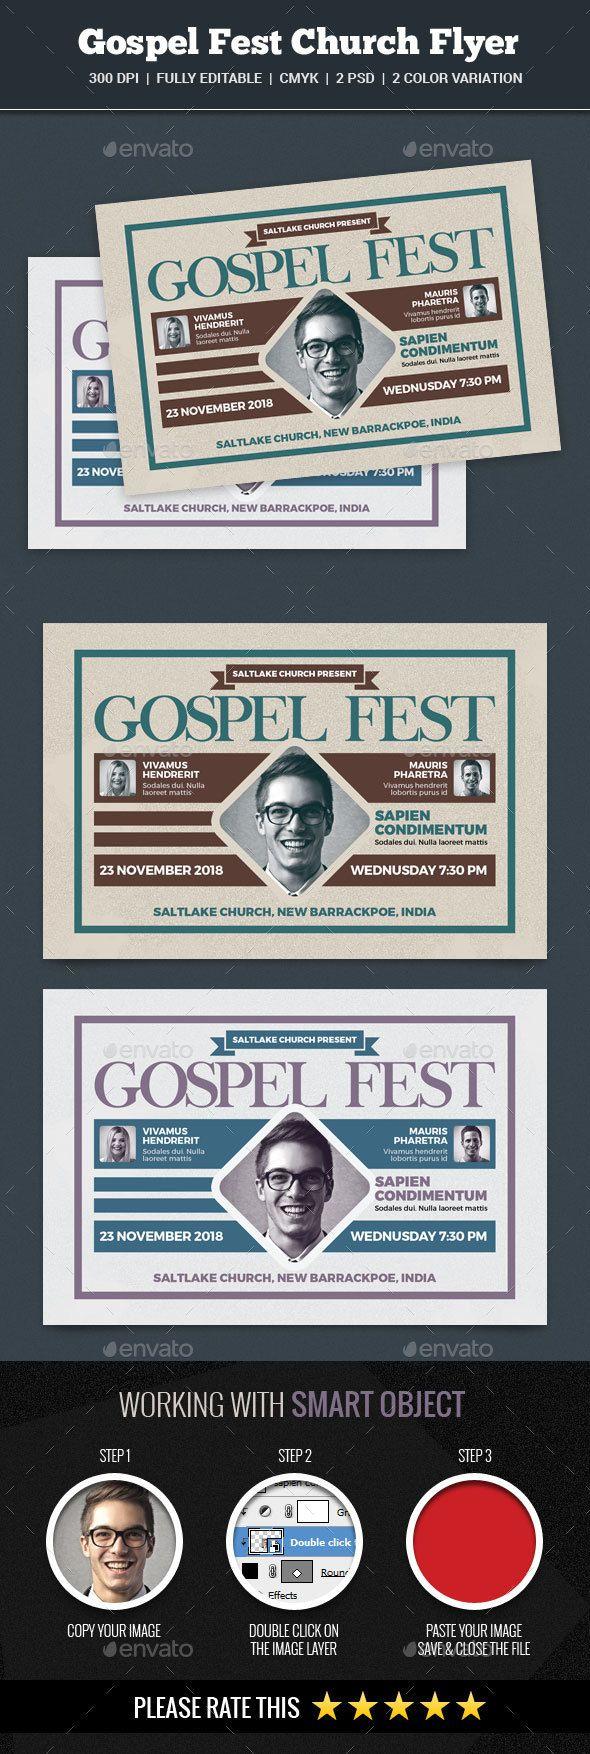 Gospel Fest Church Flyer | Flyer template, Churches and Template